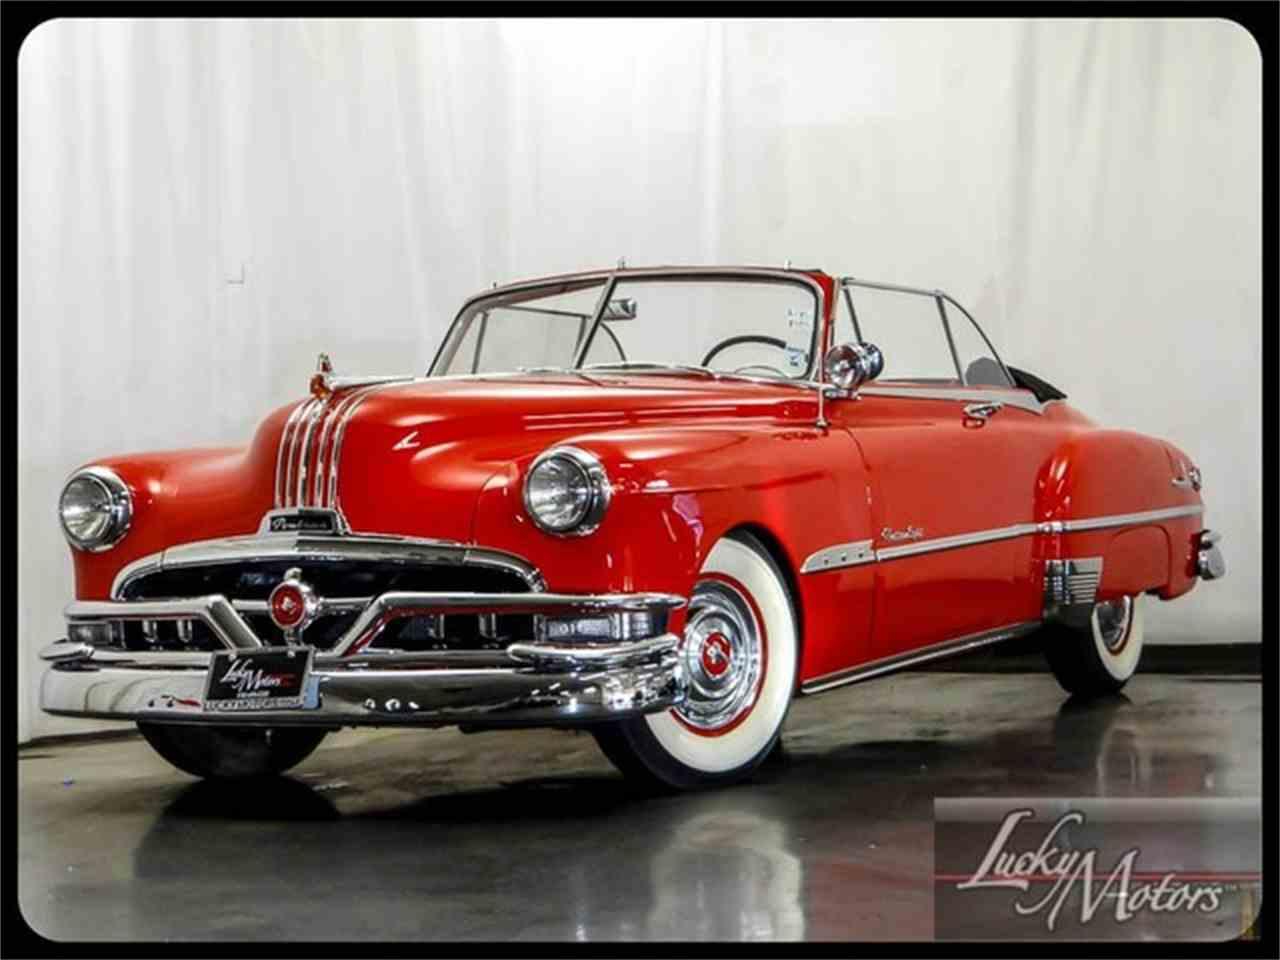 1951 Pontiac Coupe For Sale: 1951 Pontiac Chieftain For Sale